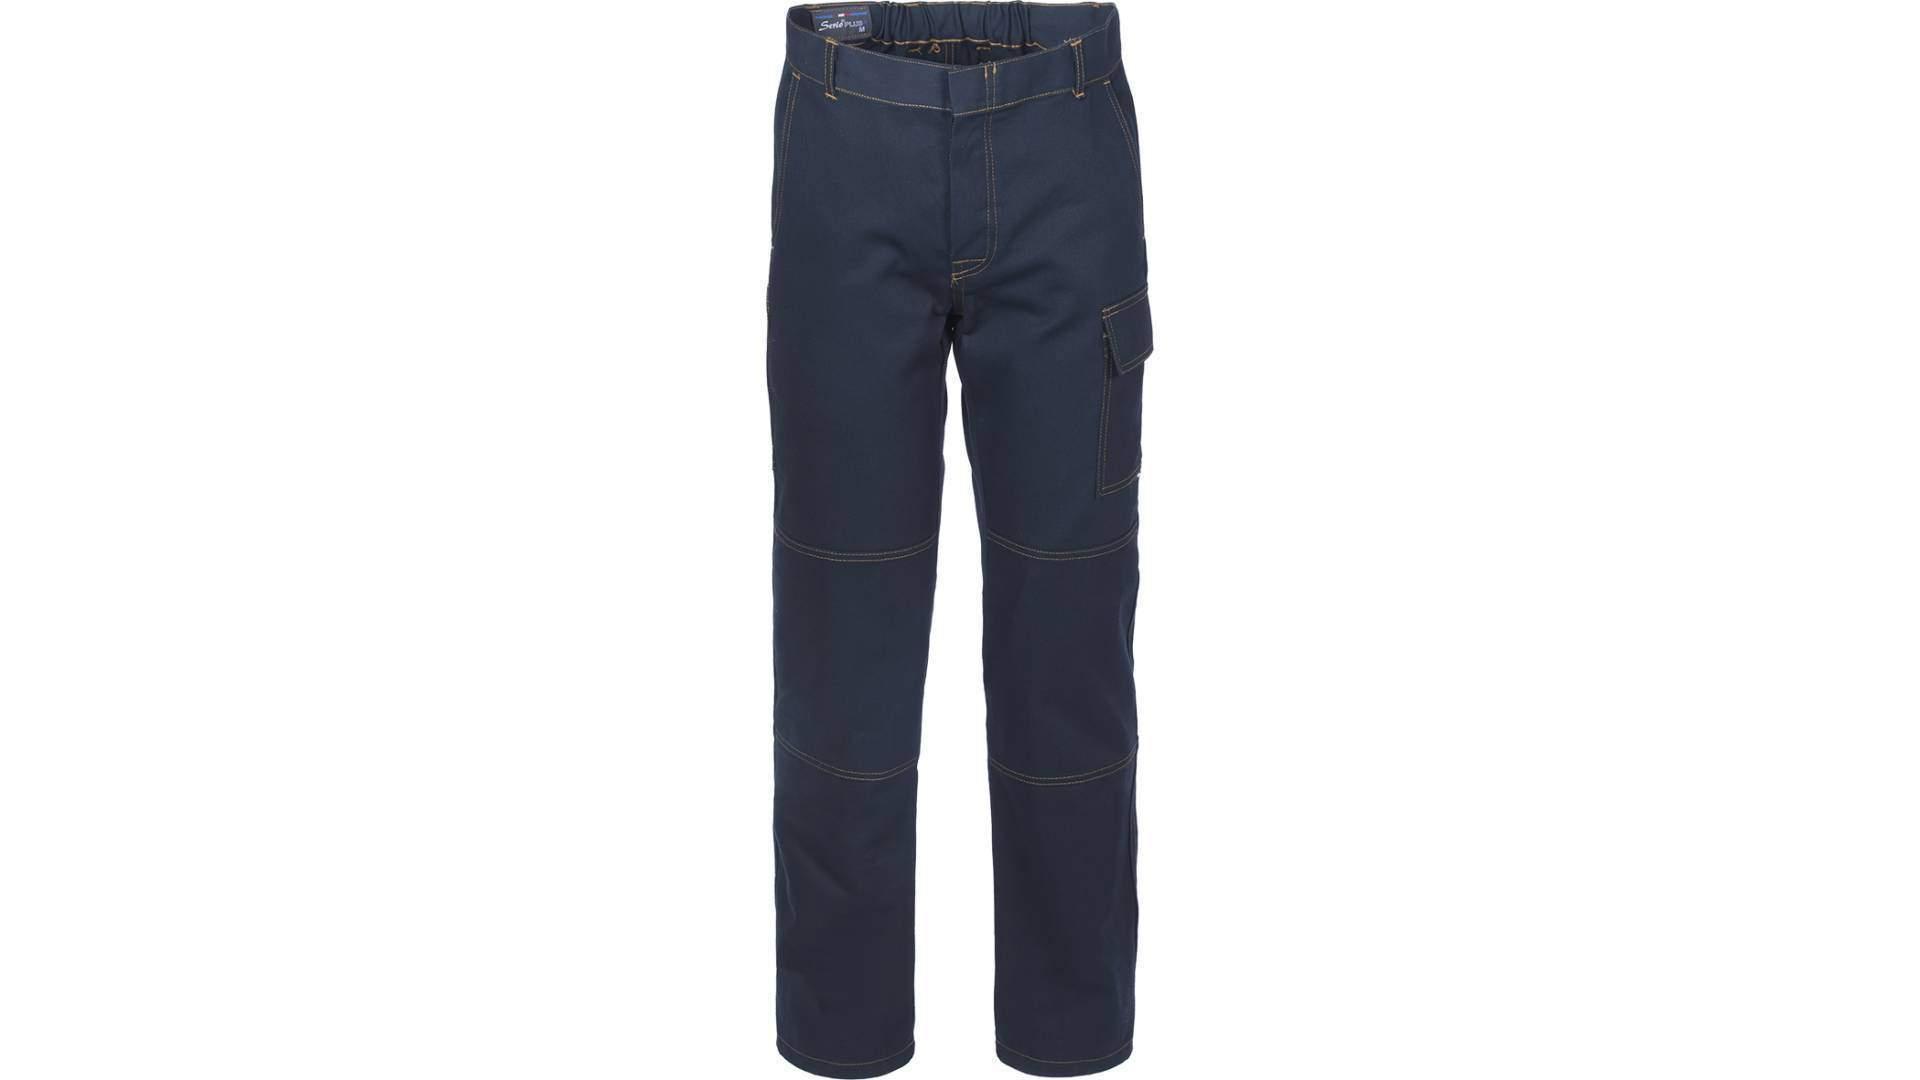 Pantalone Da Lavoro Serioplus Dress Safe